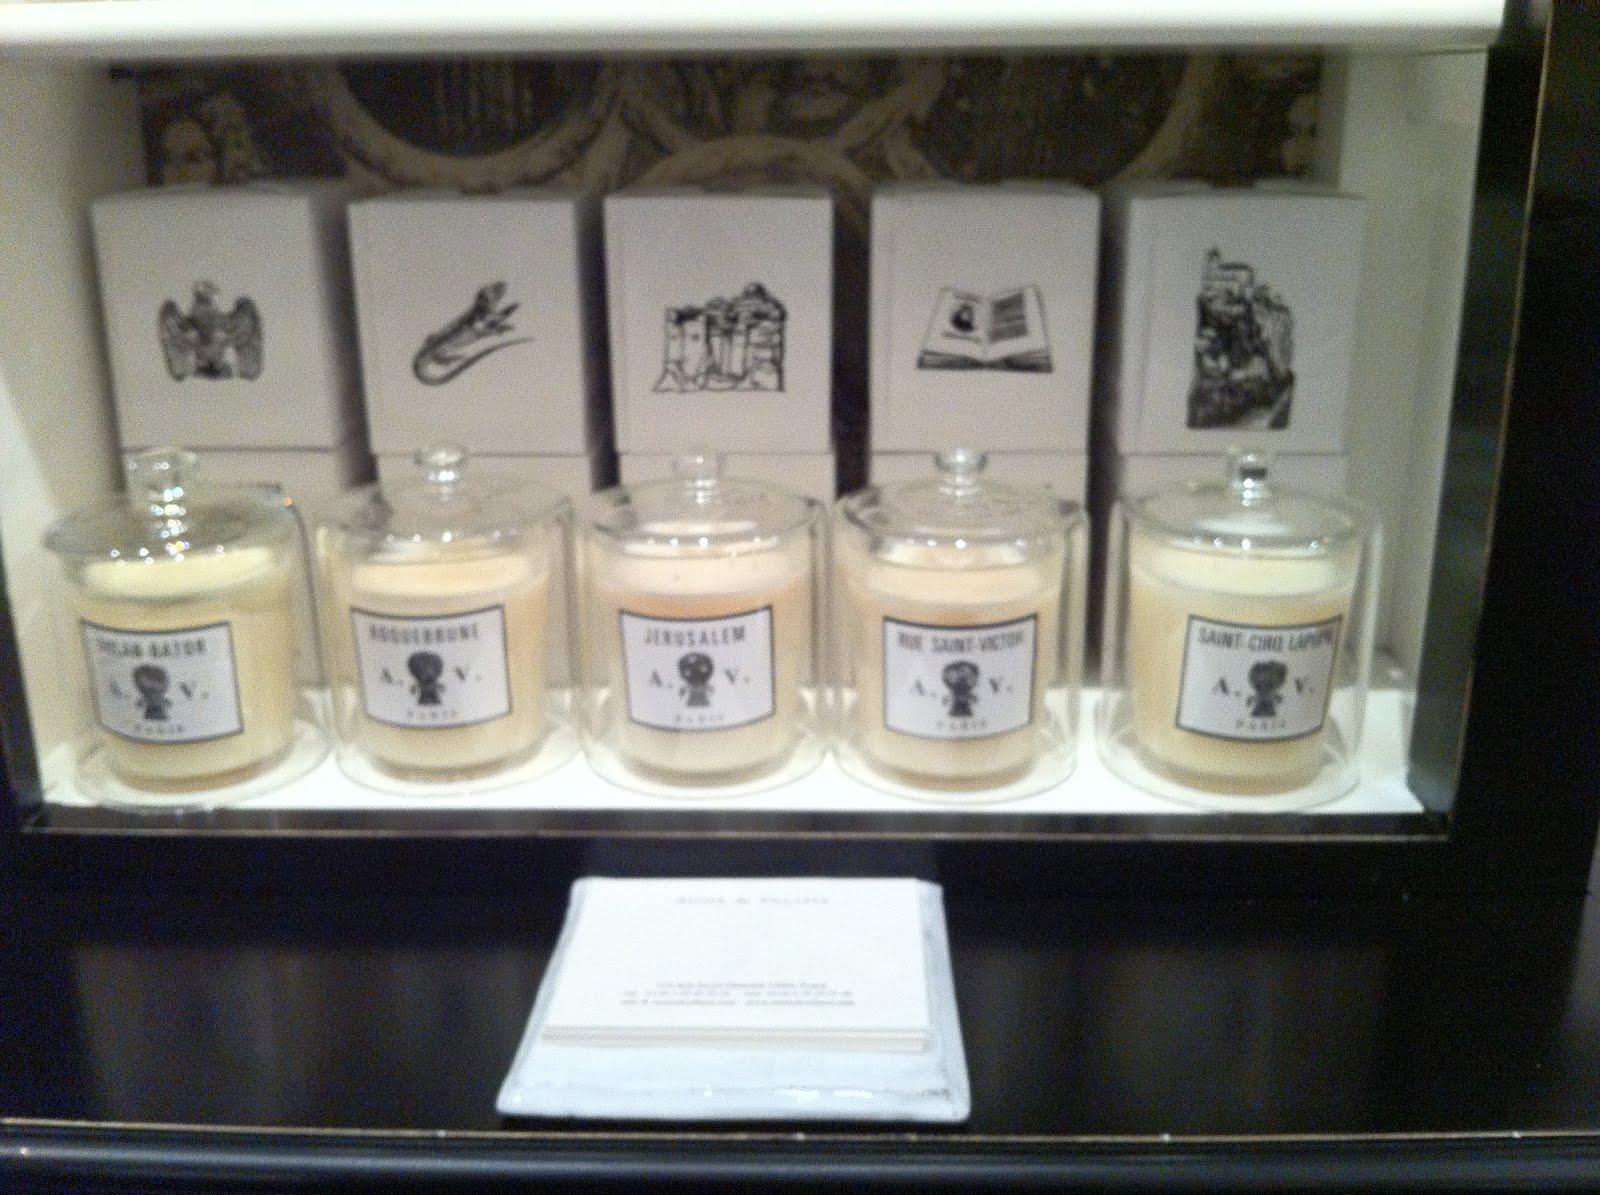 Peony haute parfumerie melbourne new astier de villatte delivery - Astier de villatte prix ...